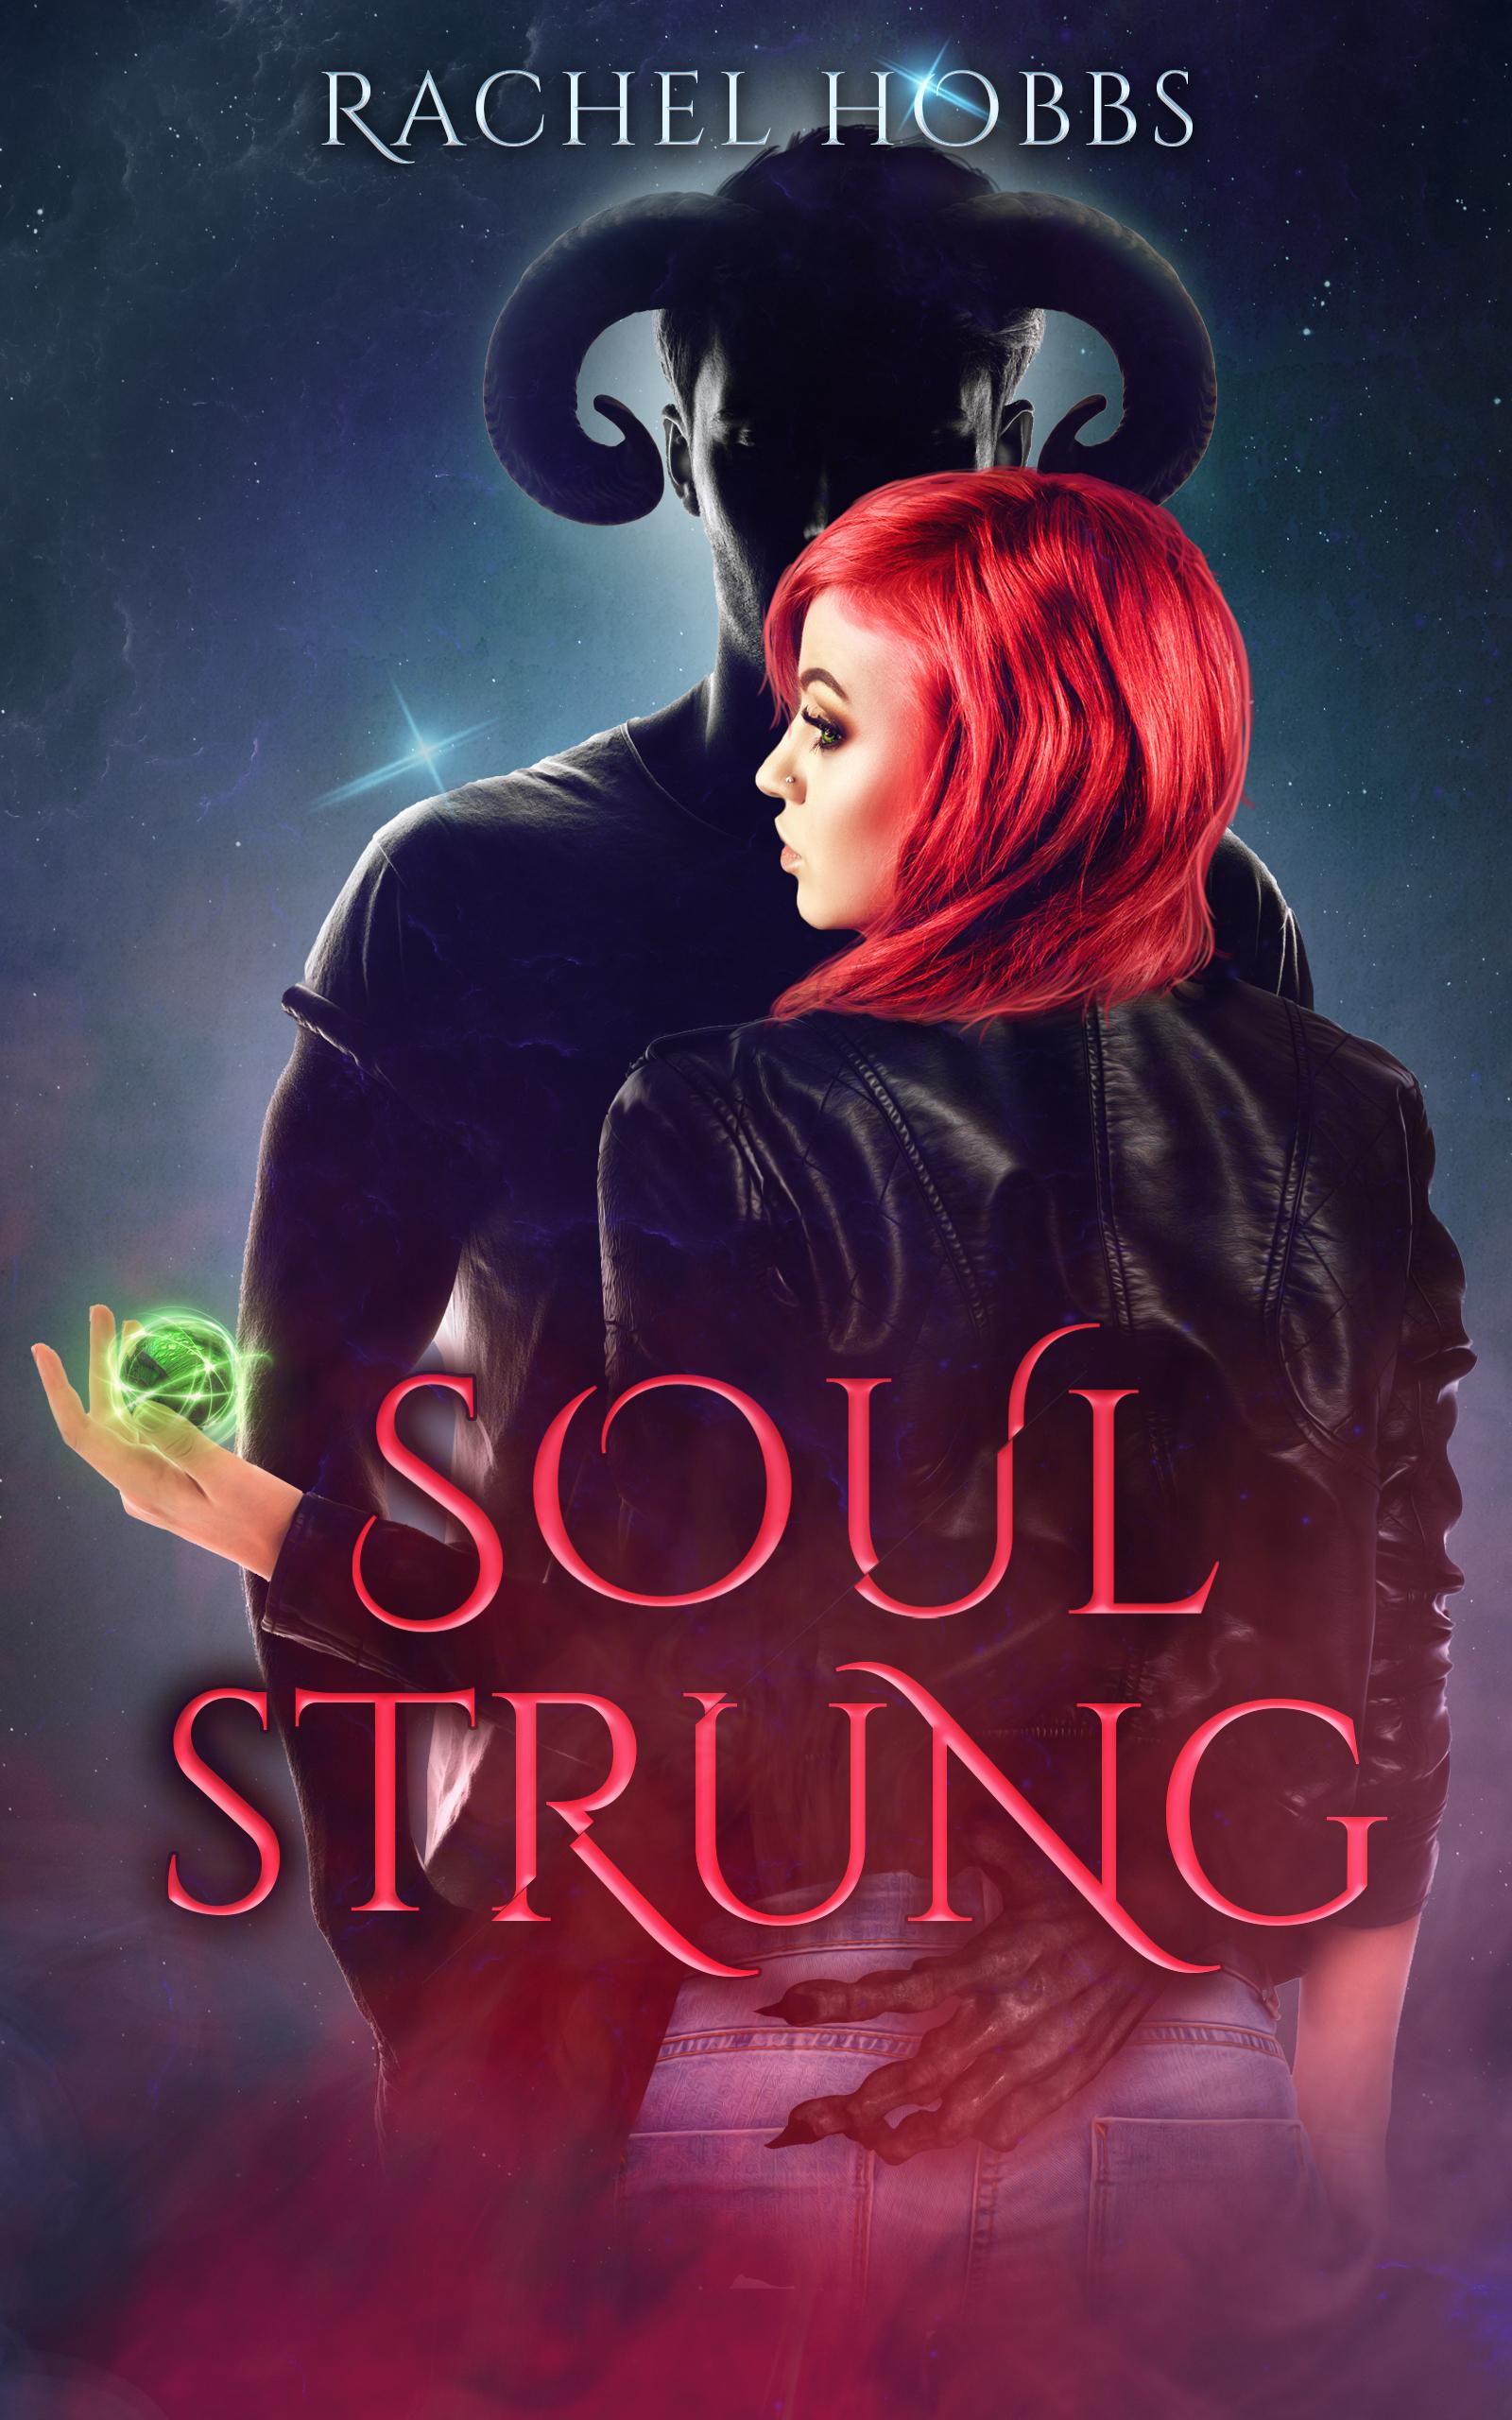 Soul-Strung (Stones of Power #2) Rachel Hobbs Book Cover